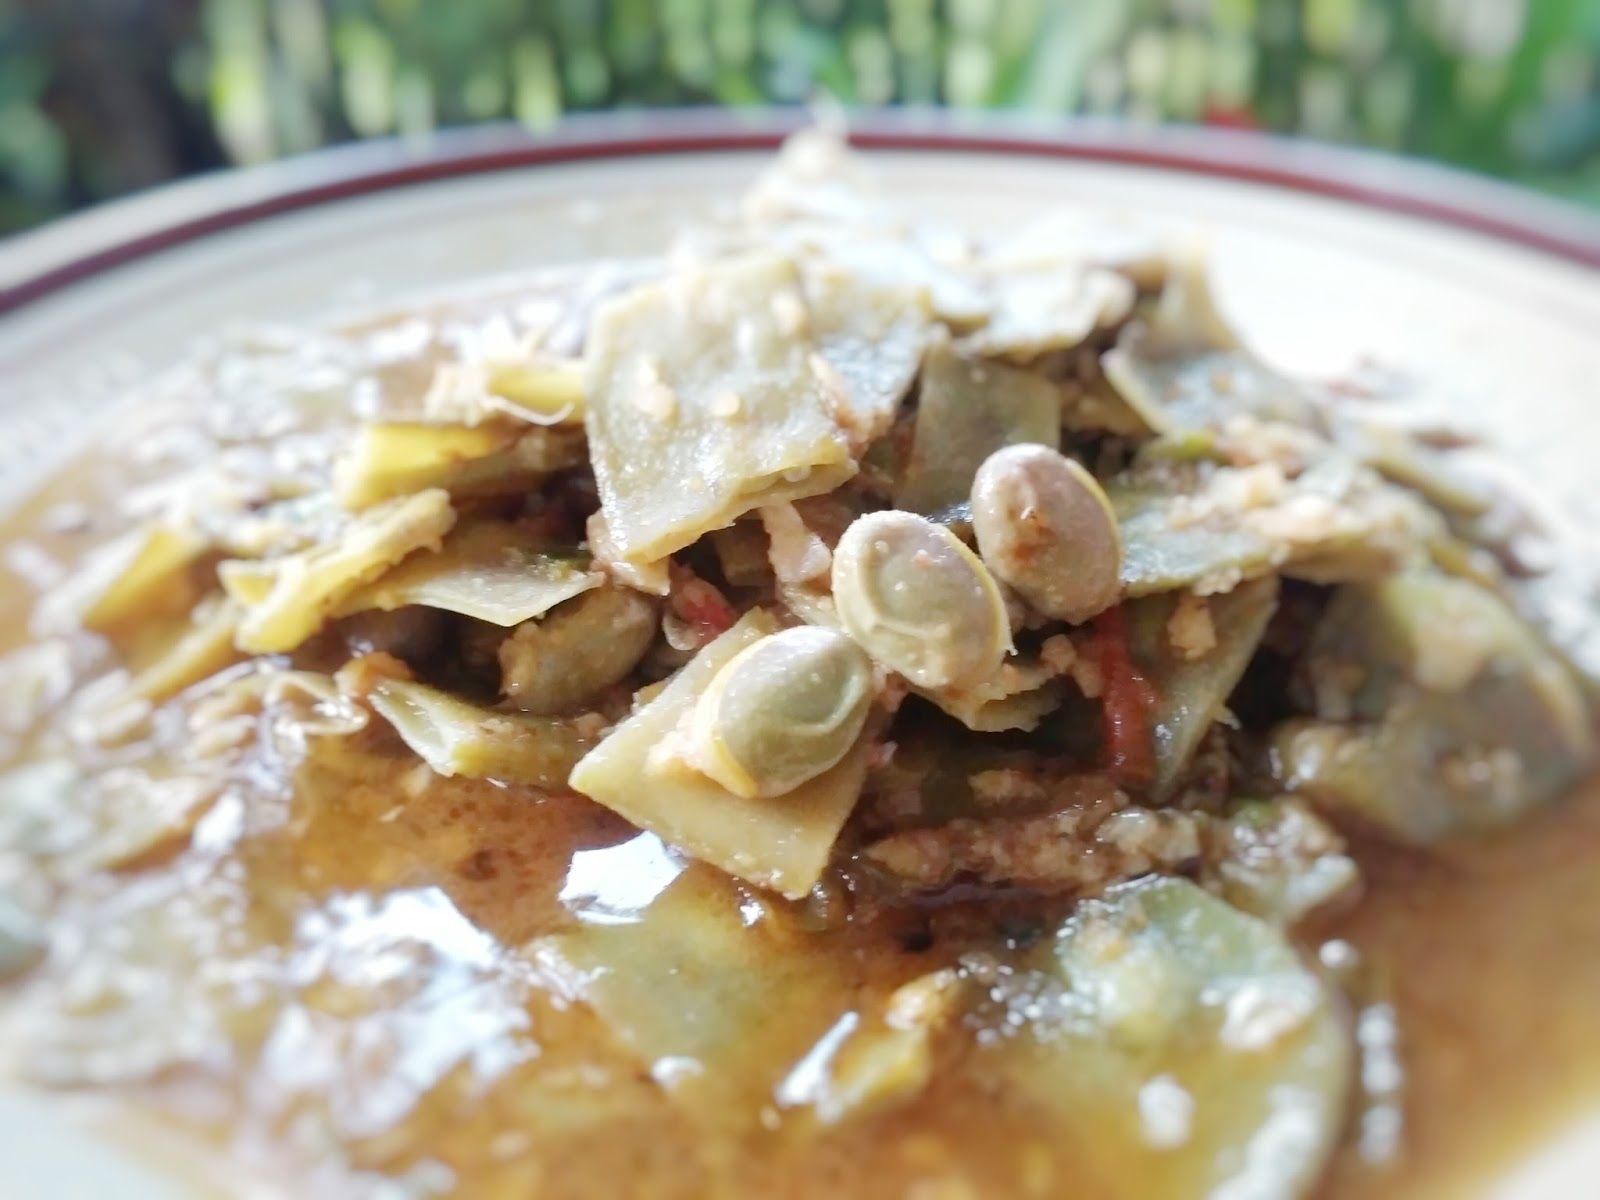 Resep Tumis Kacang Kara Resep Tumis Resep Masakan Makanan